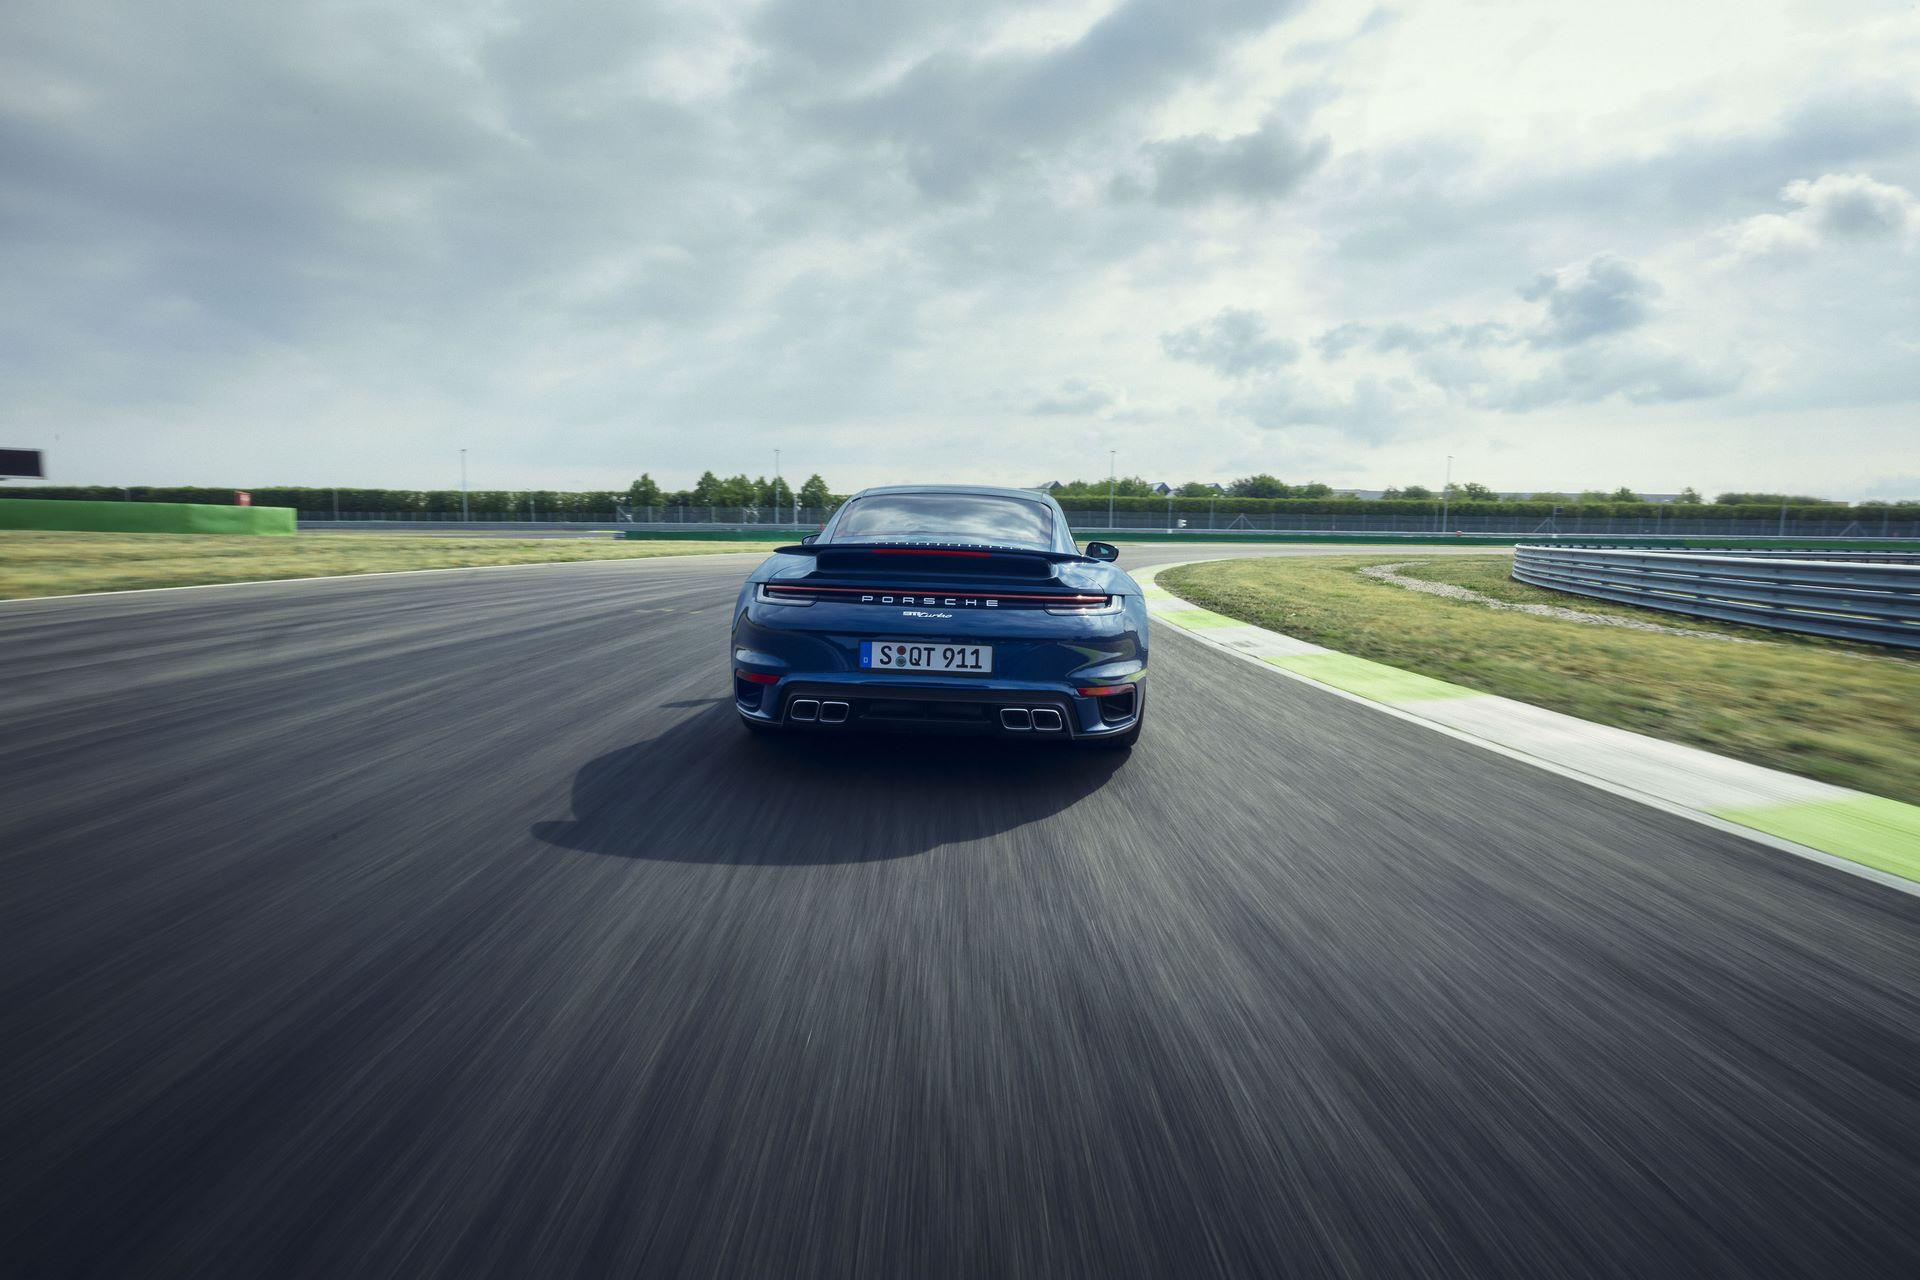 Porsche-911-Turbo-2020-10